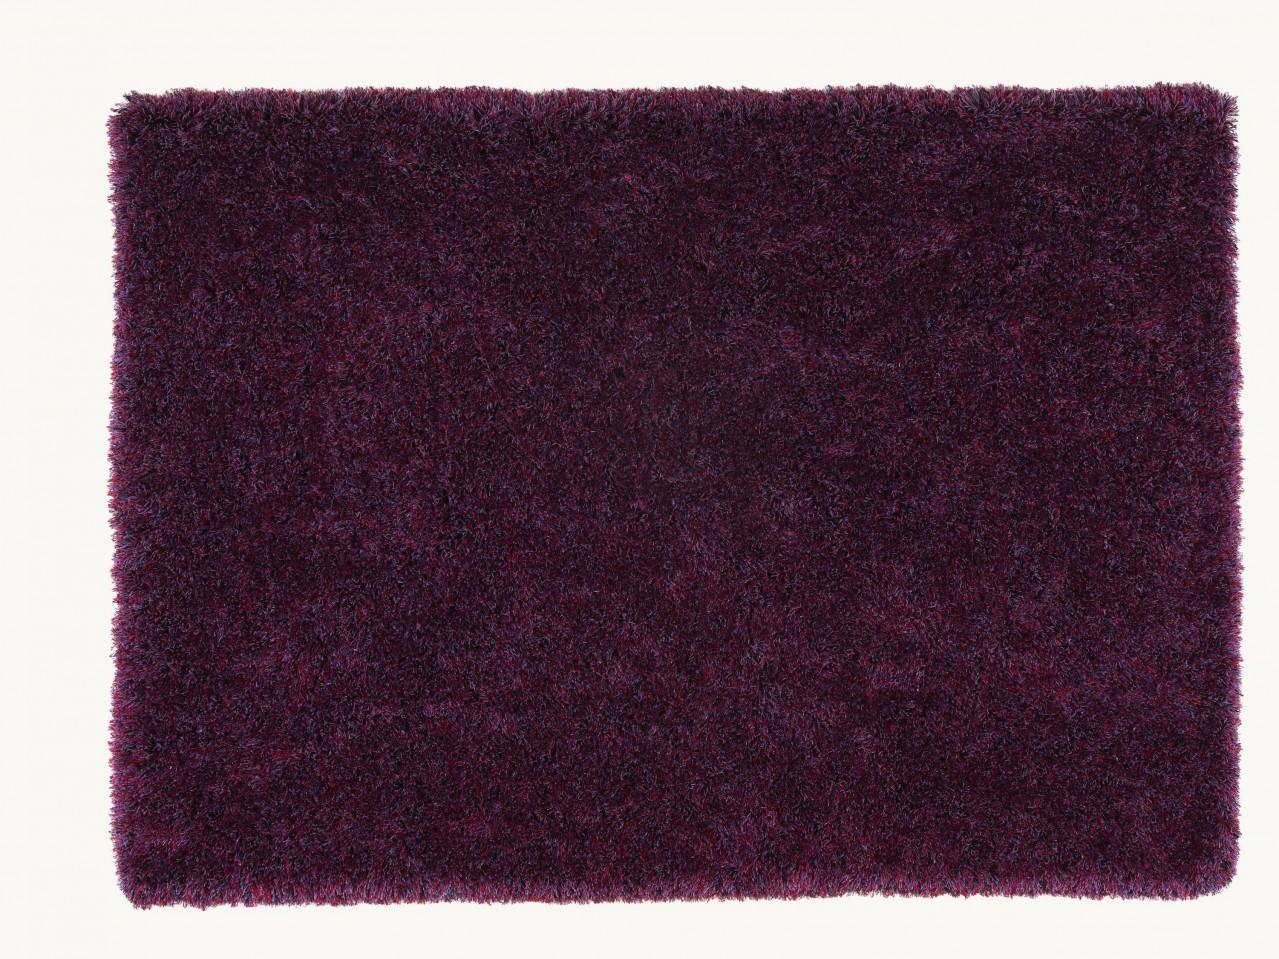 home teppiche hochflor langflor teppiche rot und dunkelrot. Black Bedroom Furniture Sets. Home Design Ideas